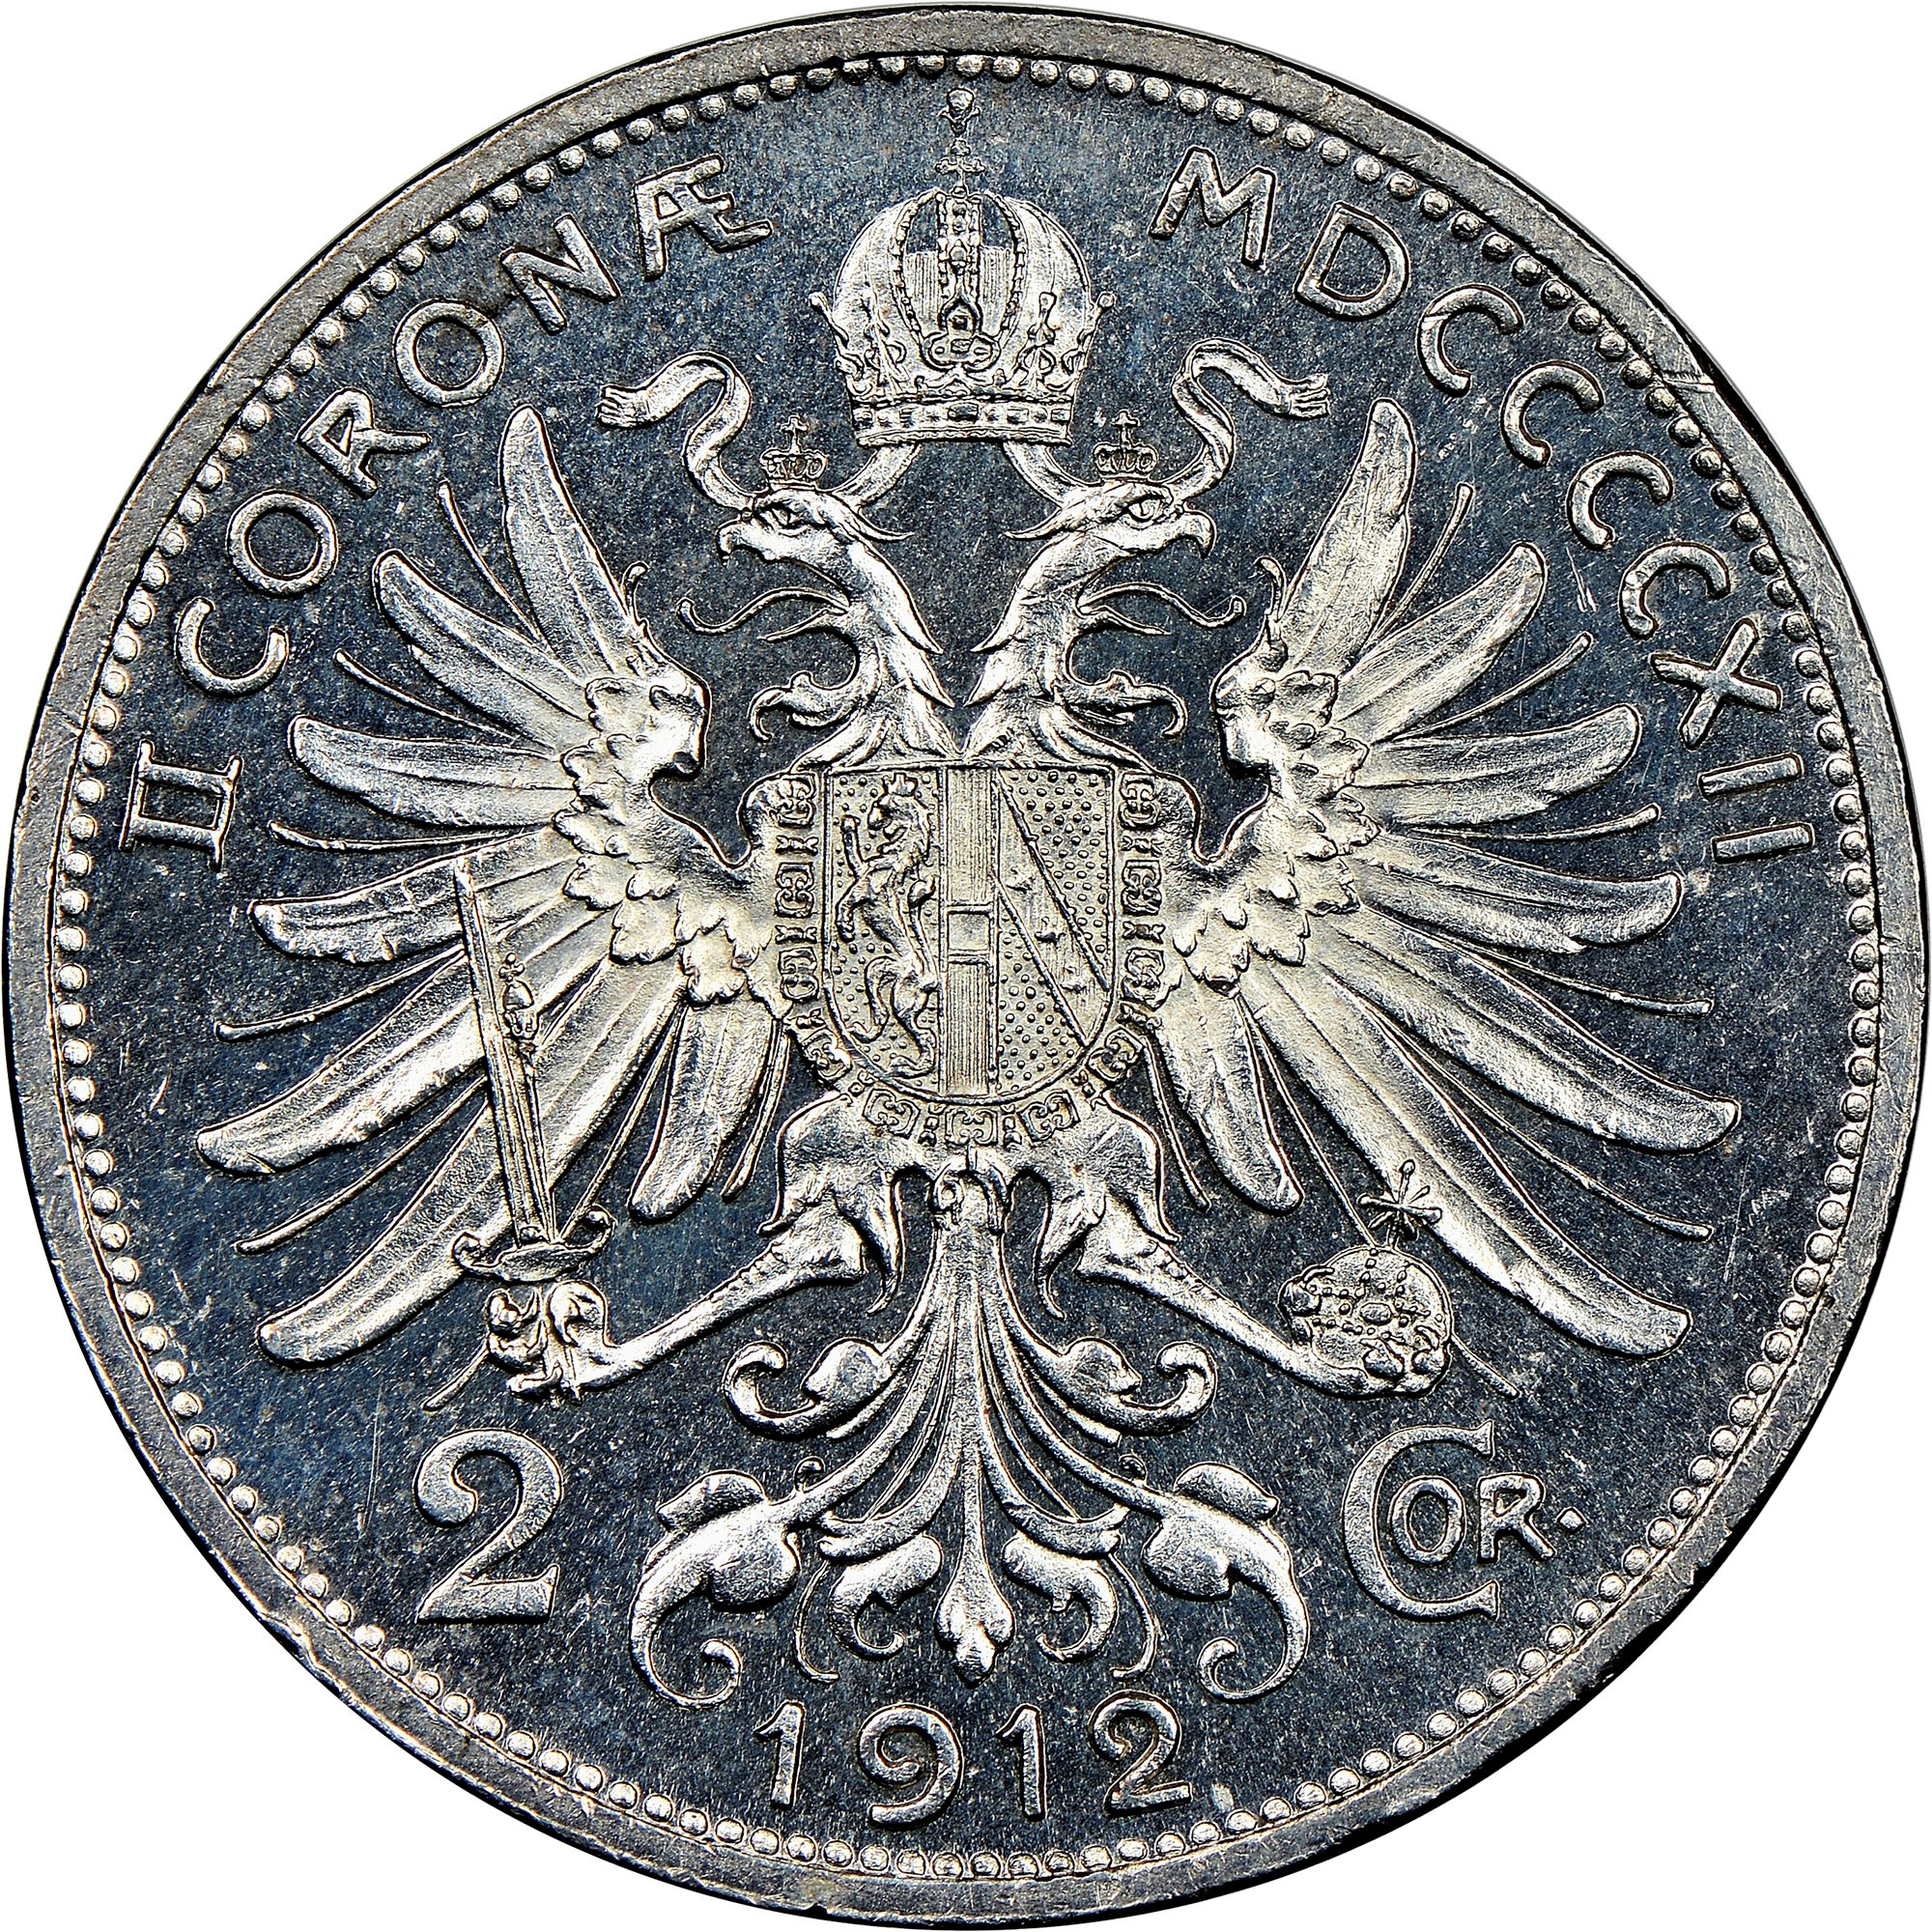 Austria 2 Corona reverse